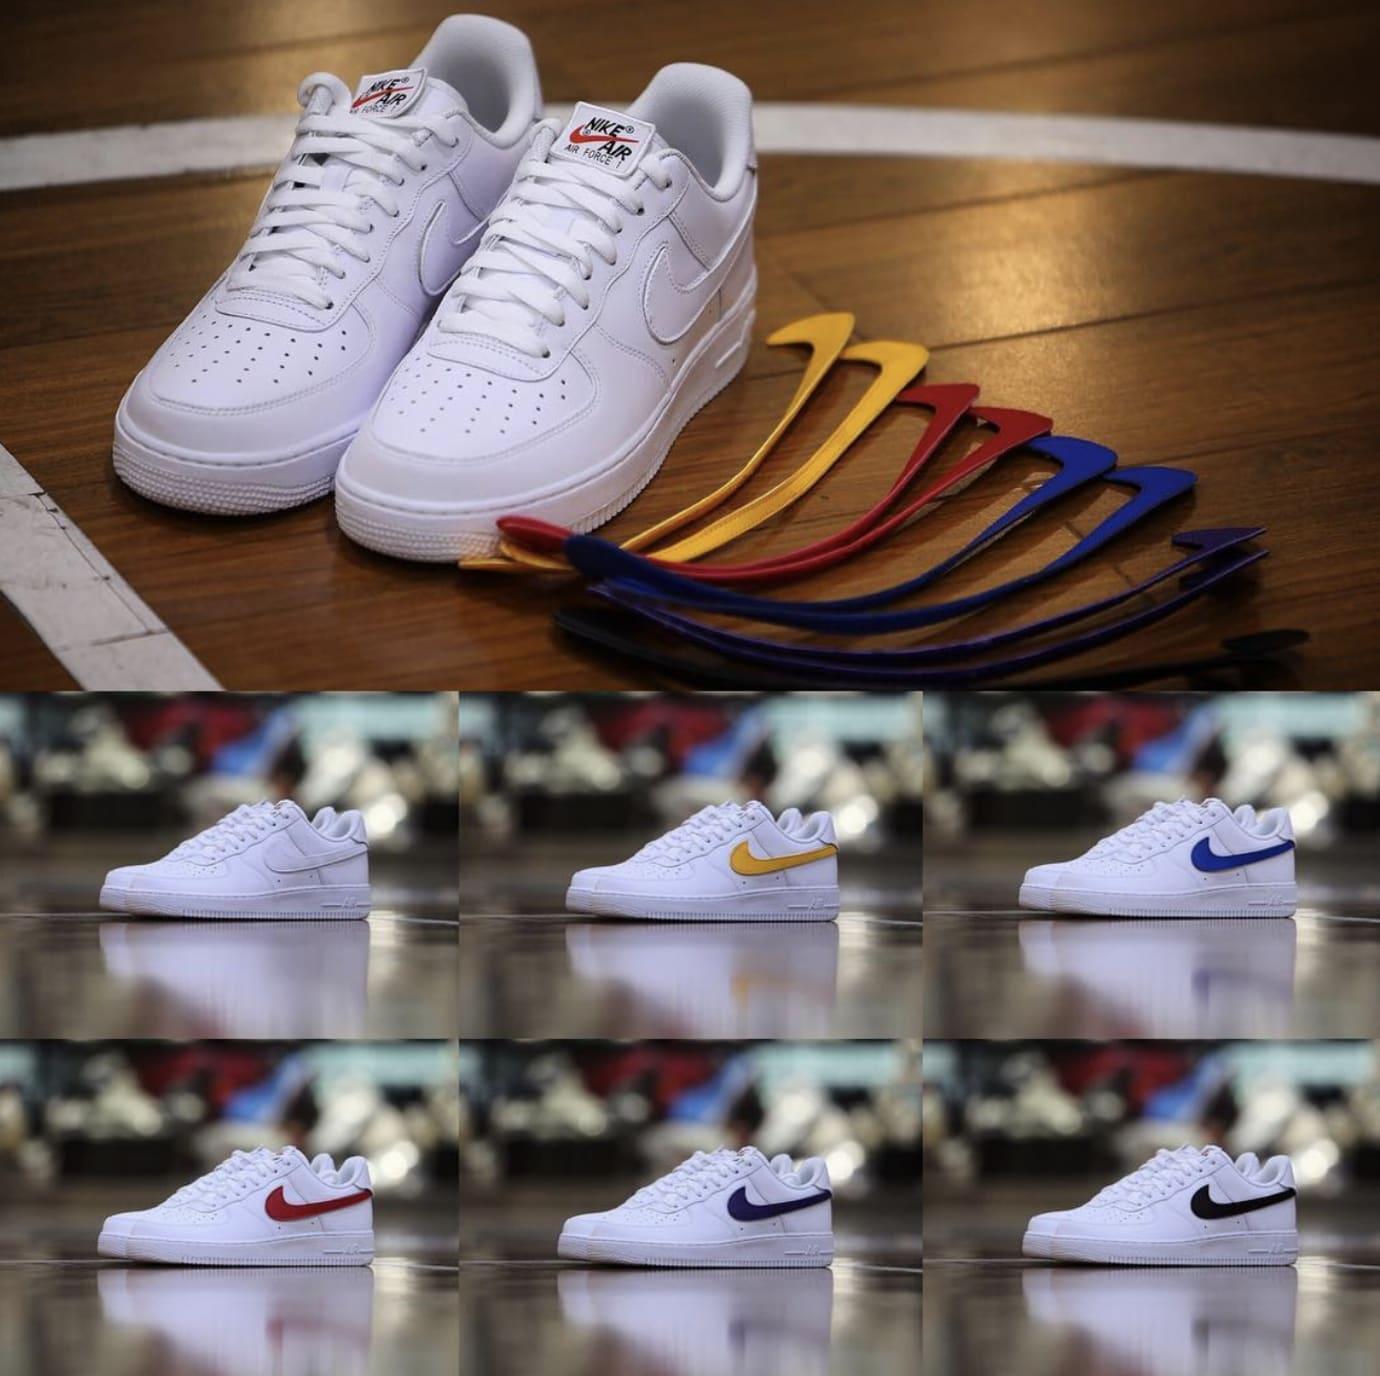 Nike Air Force 1 'All Star/White